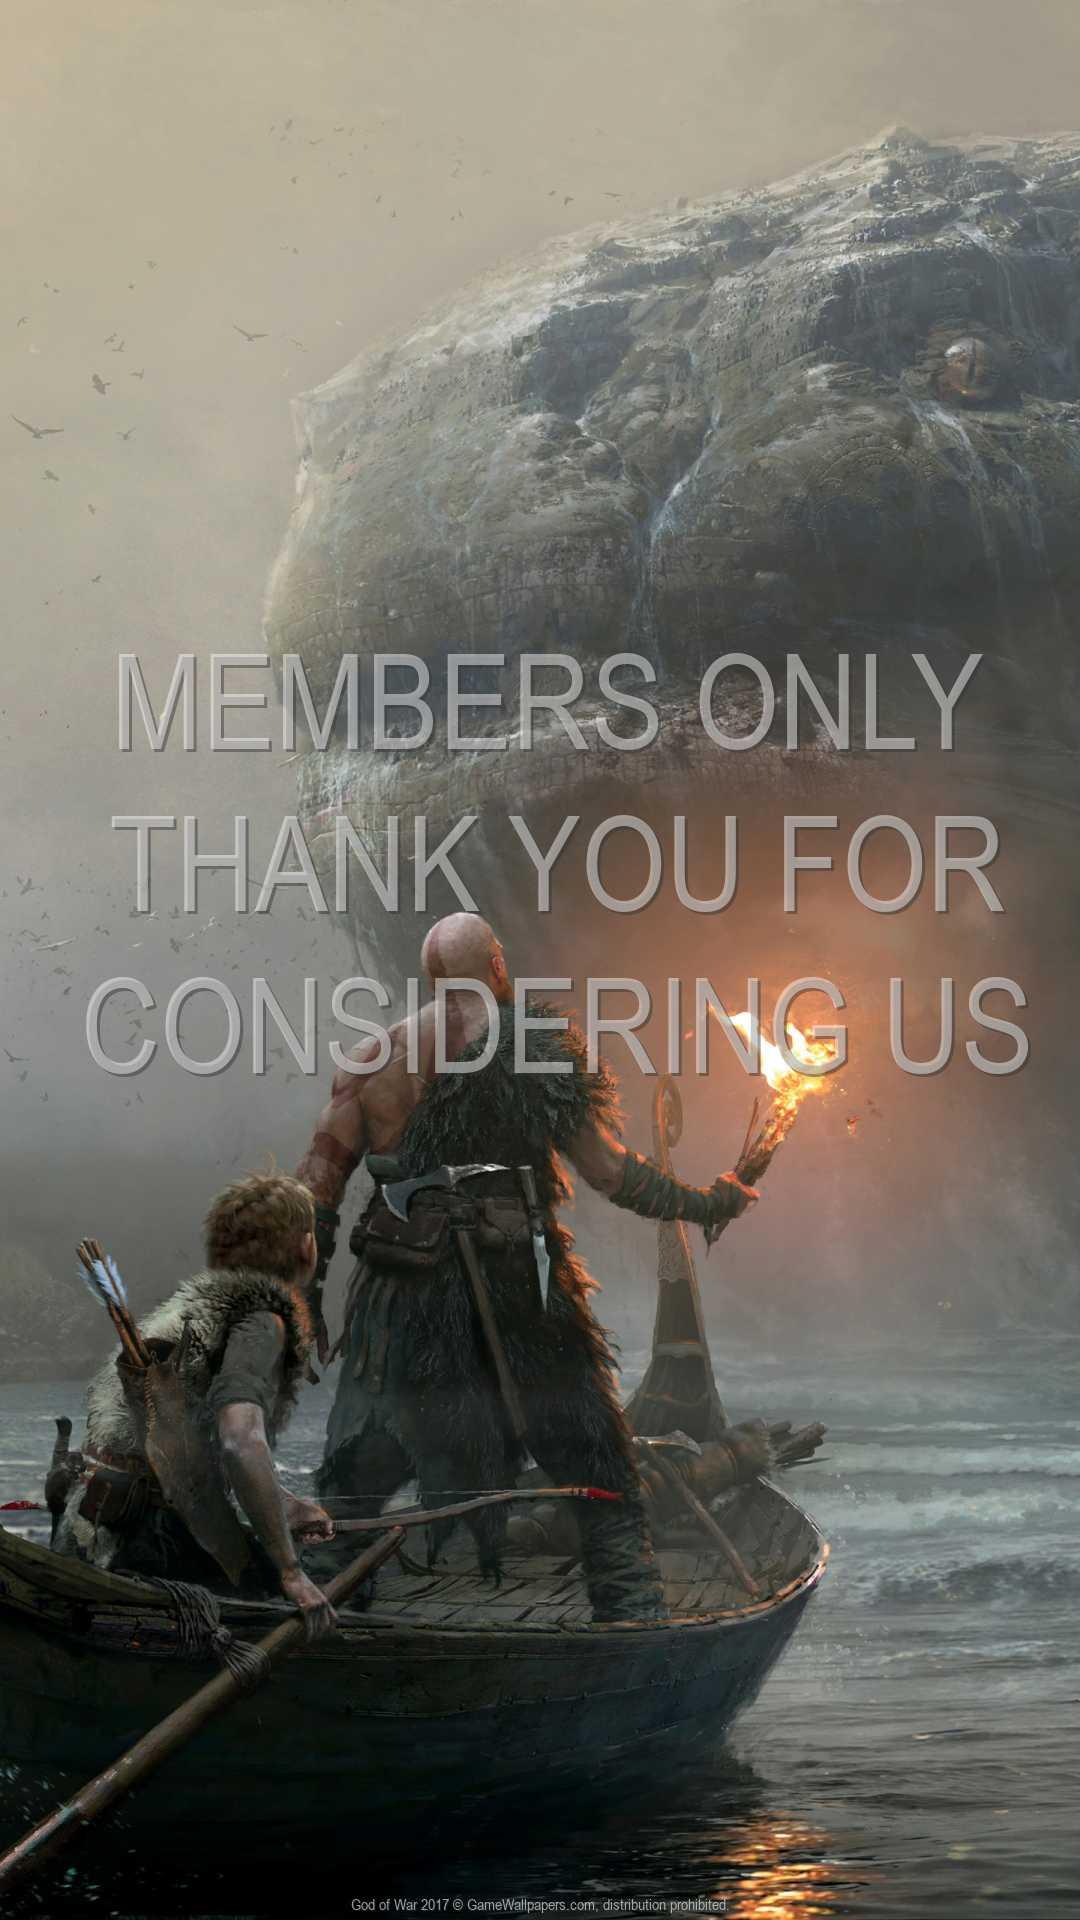 God of War 2017 1080p Vertical Mobile fond d'écran 09